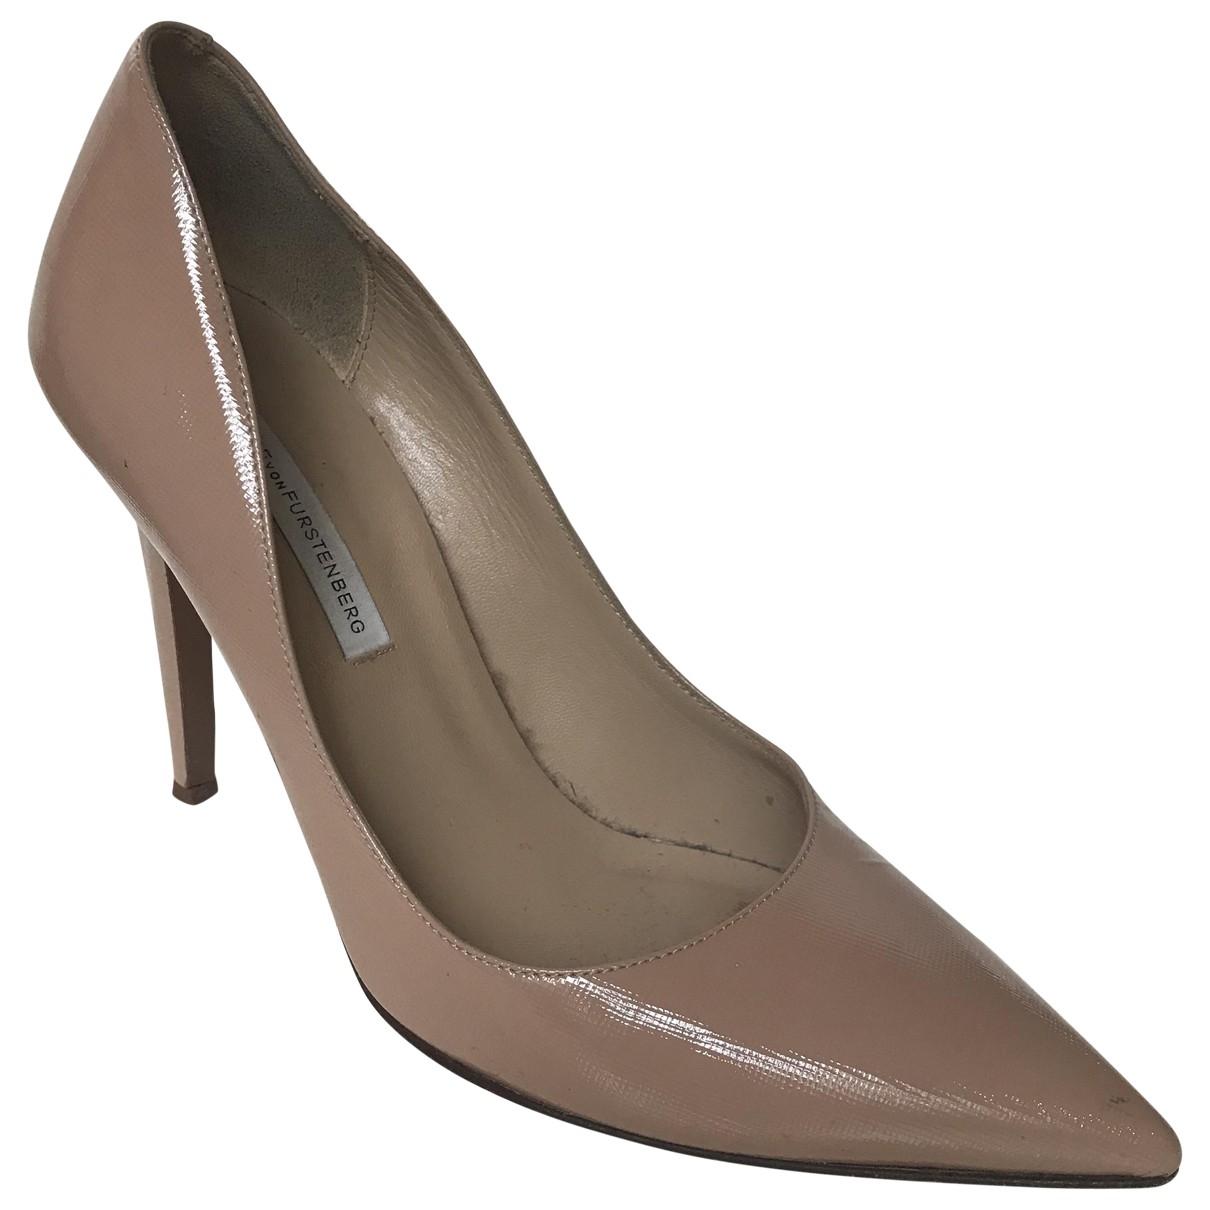 Diane Von Furstenberg - Escarpins   pour femme en cuir verni - rose